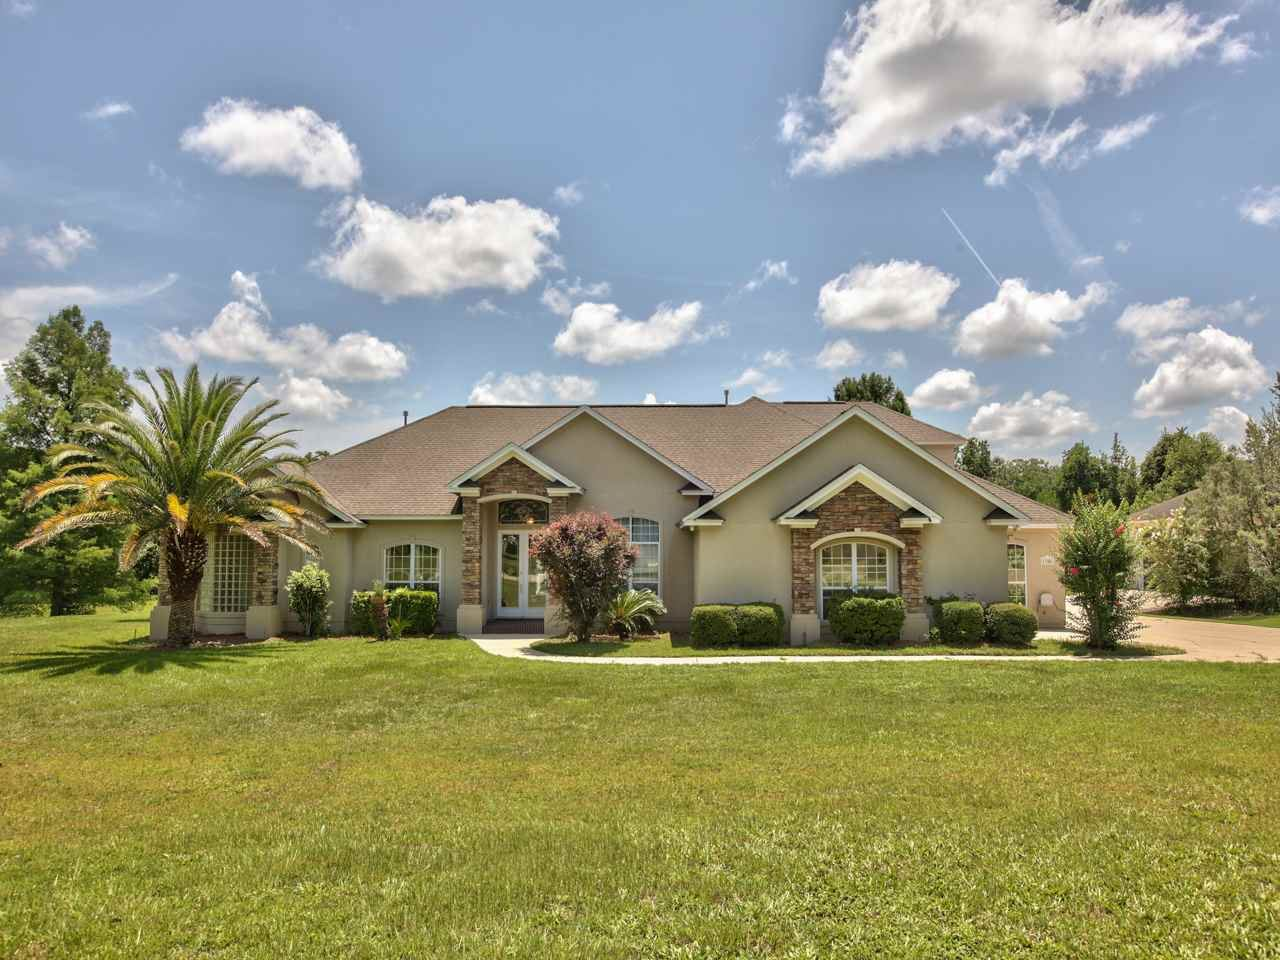 1726 Vineyard Way, Tallahassee, FL 32317 - MLS#: 321886